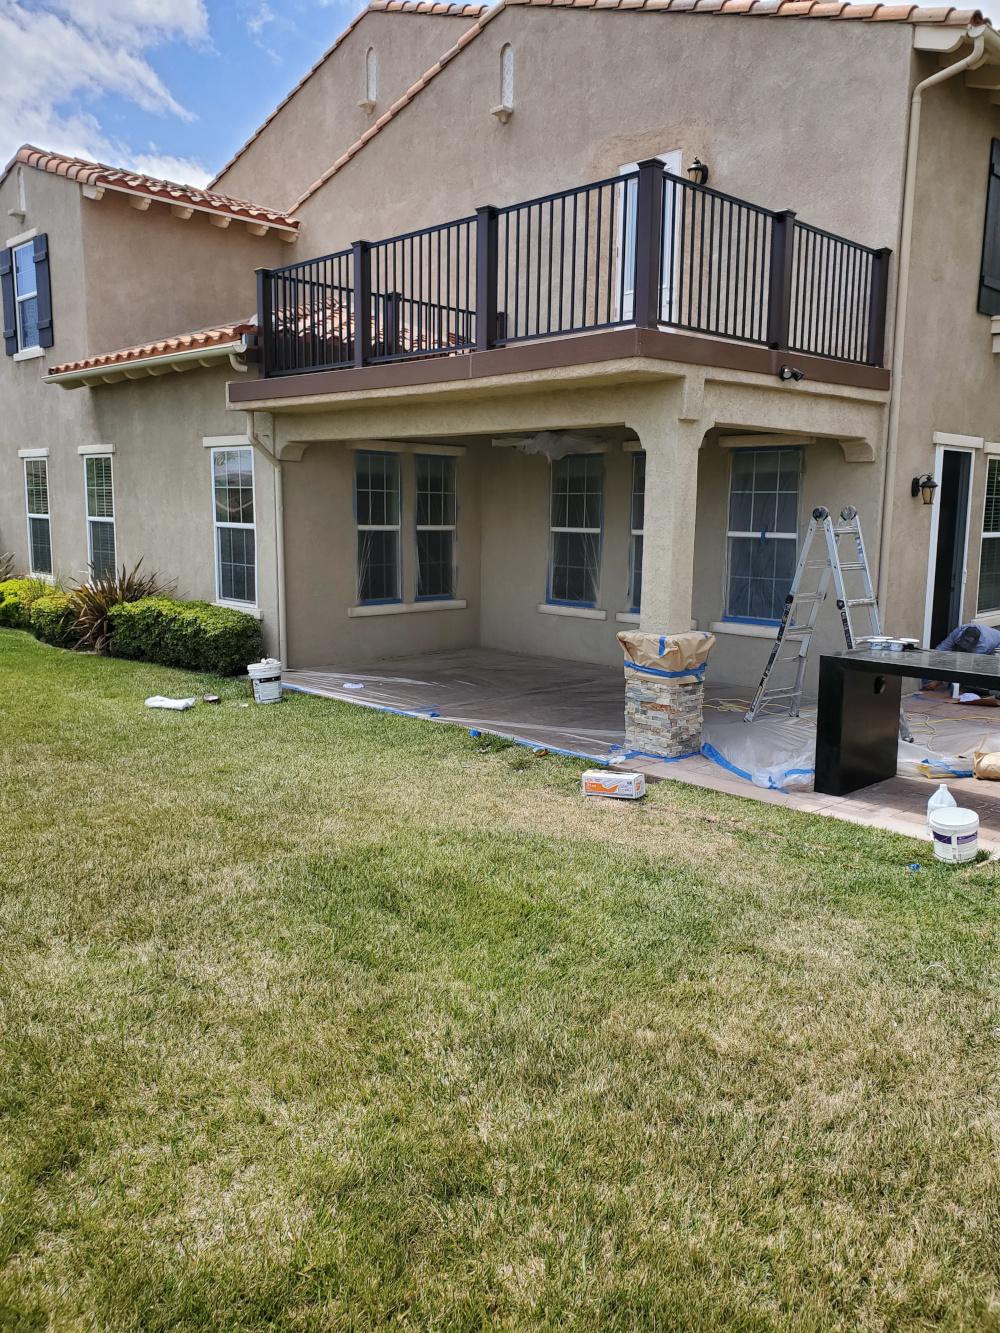 Custom patio cover with balcony